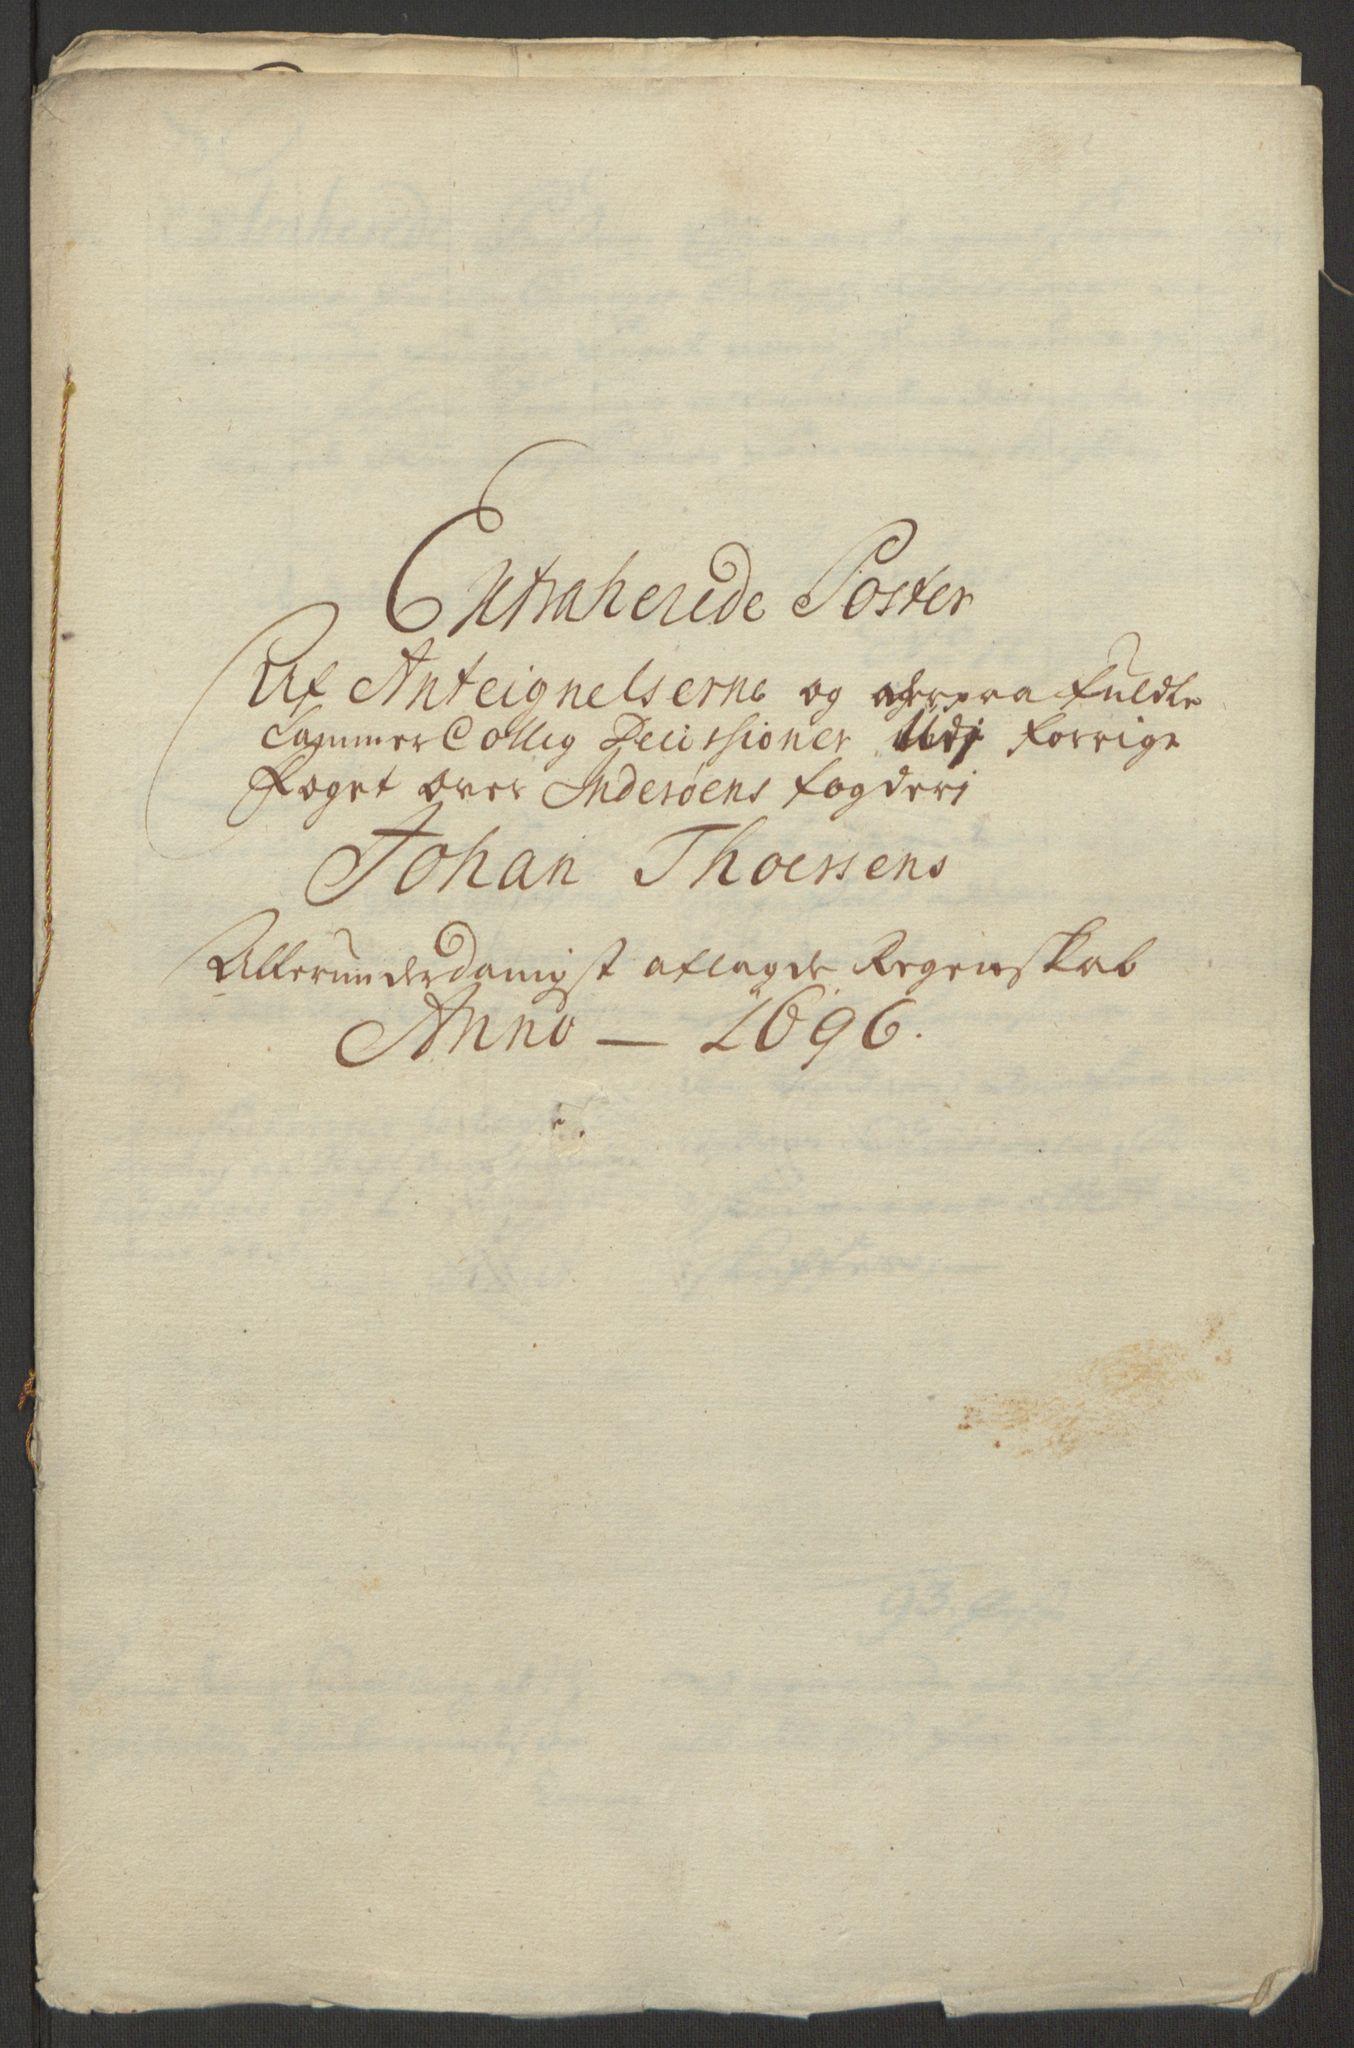 RA, Rentekammeret inntil 1814, Reviderte regnskaper, Fogderegnskap, R63/L4309: Fogderegnskap Inderøy, 1695-1697, s. 365